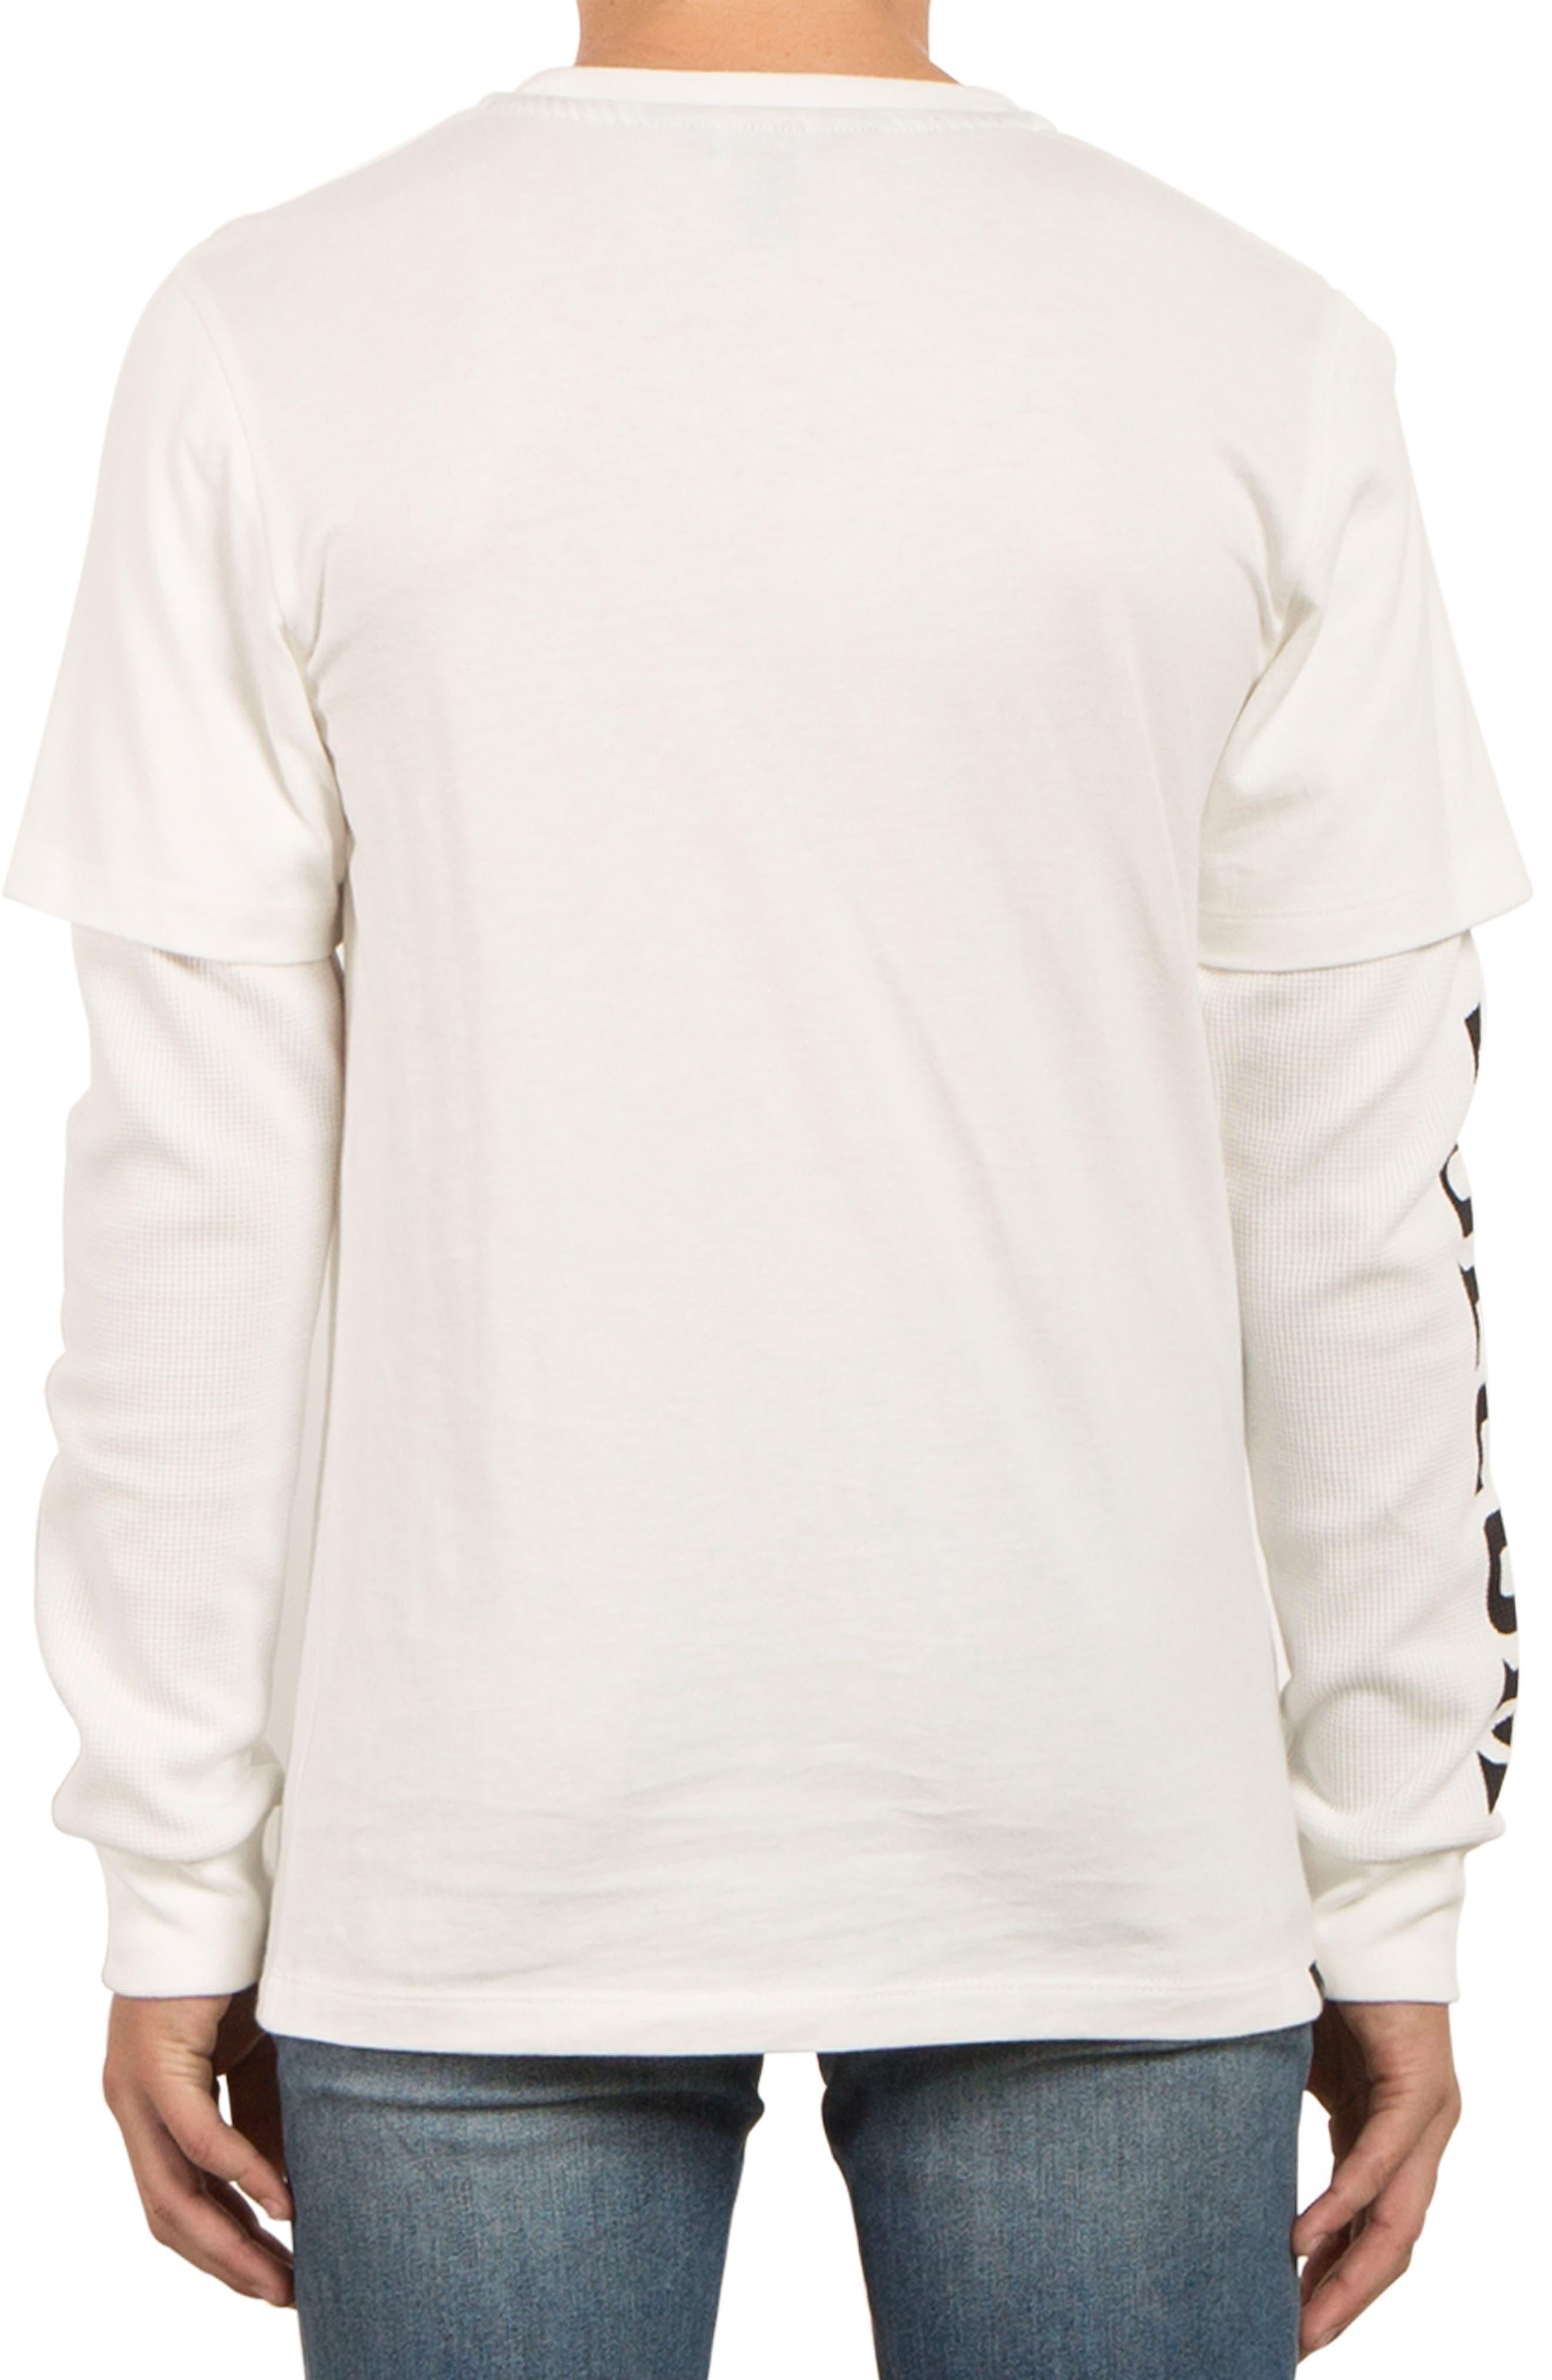 Easton Long Sleeve T-Shirt,                             Alternate thumbnail 4, color,